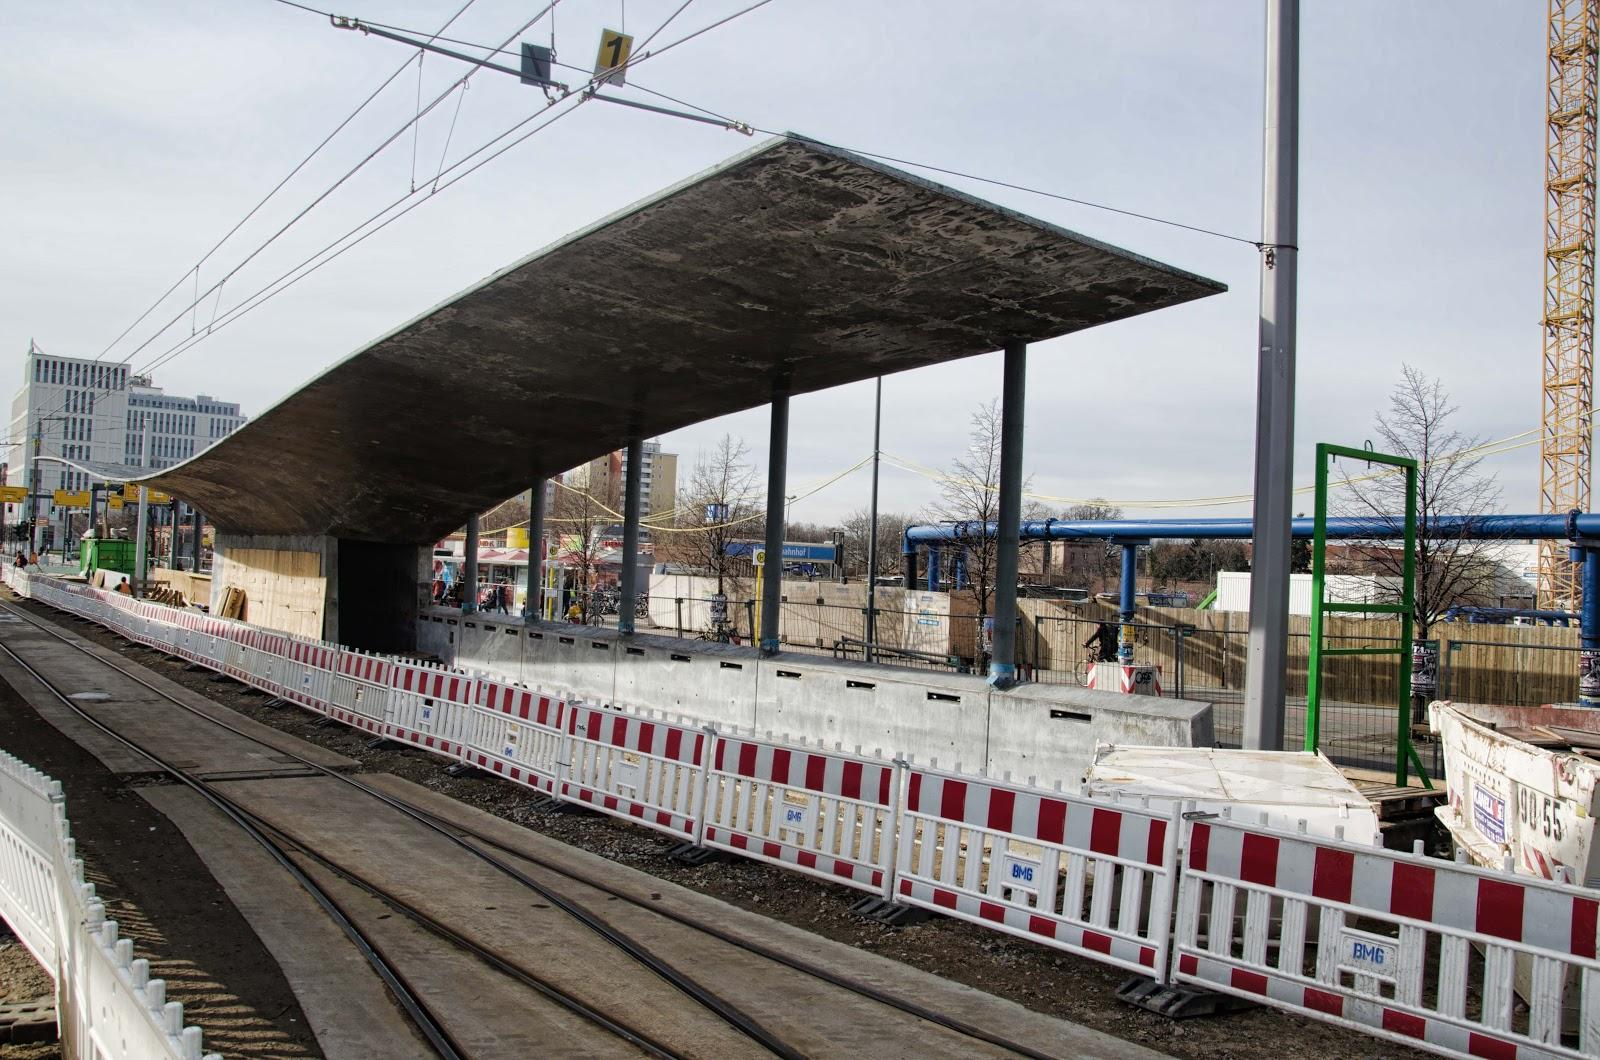 Baustelle Tram-Station am Hauptbahnhof, M6, M8, M10, Invalidenstraße 53, 10557 Berlin, 24.02.2015